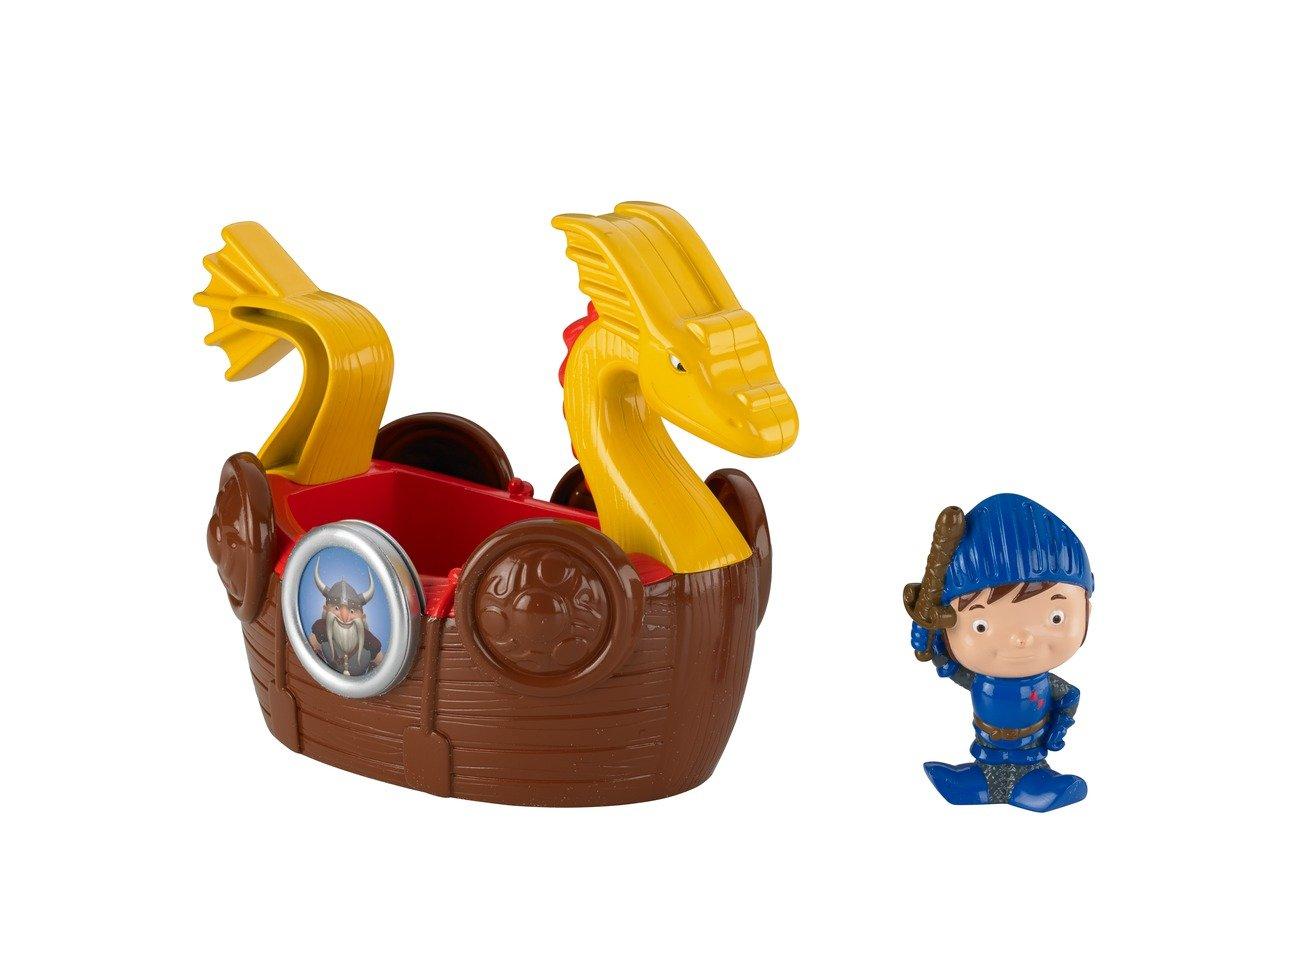 Fisher-Price Nickelodeon Mike the Knight, Bath Viking Adventure Ship